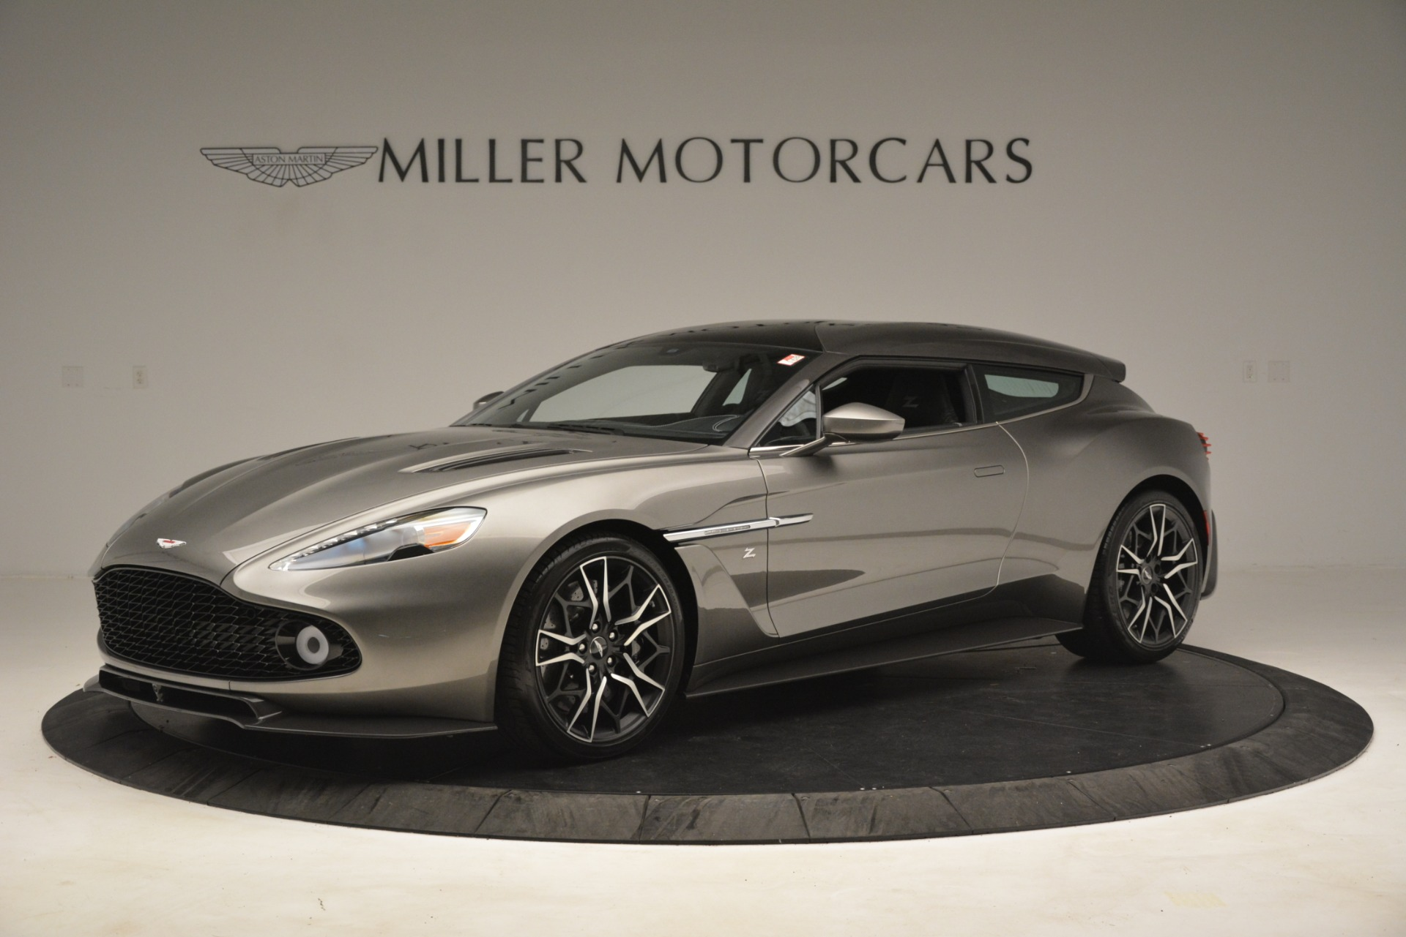 New 2019 Aston Martin Vanquish Zagato Shooting Brake For Sale In Greenwich, CT 3170_main